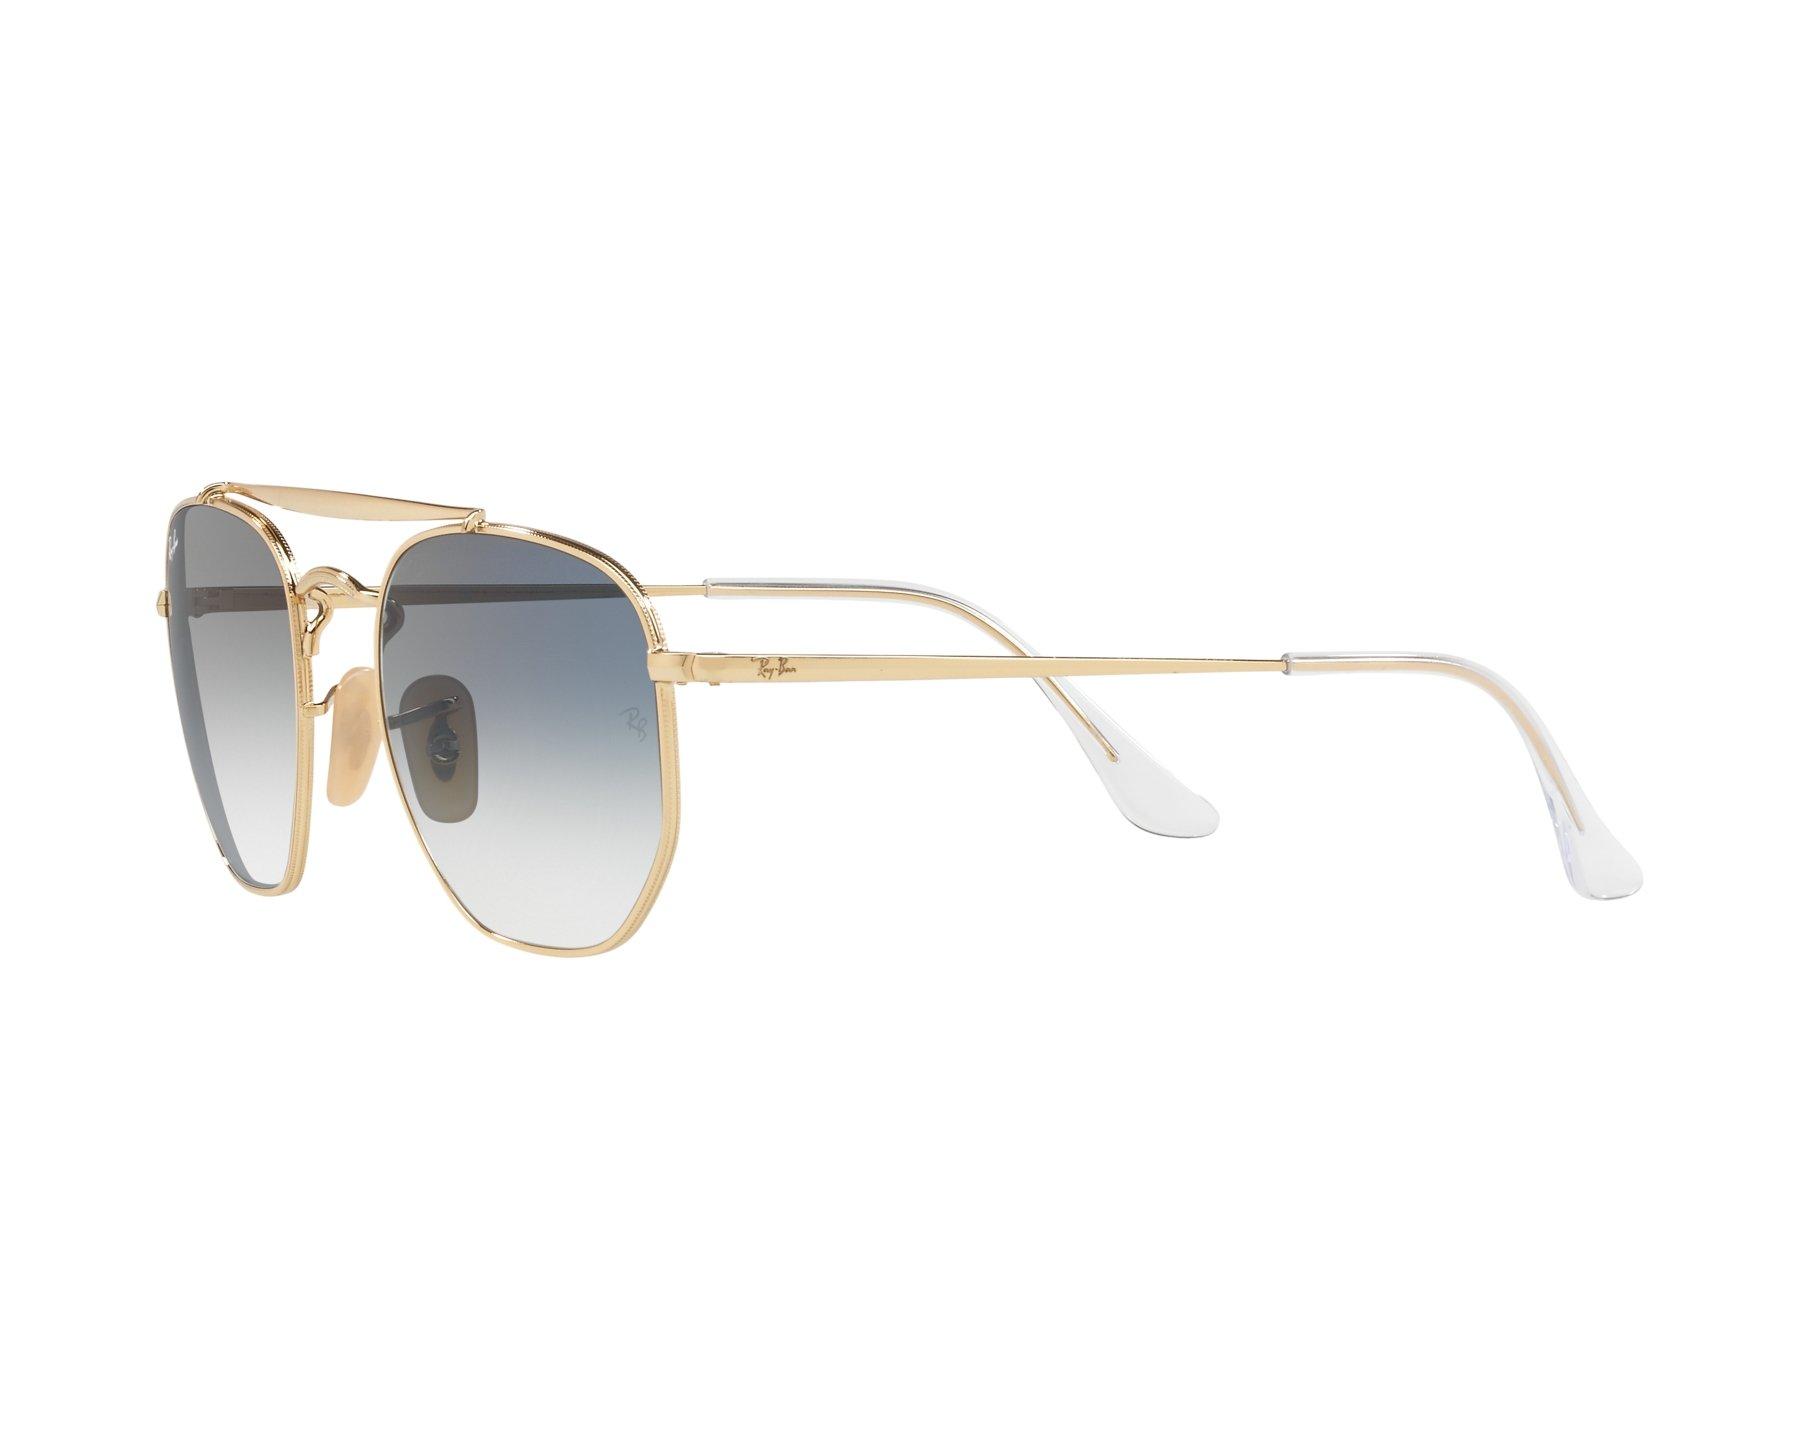 431aee4fb7fe7 Sunglasses Ray-Ban RB-3648 001 3F 54-21 Gold 360 degree